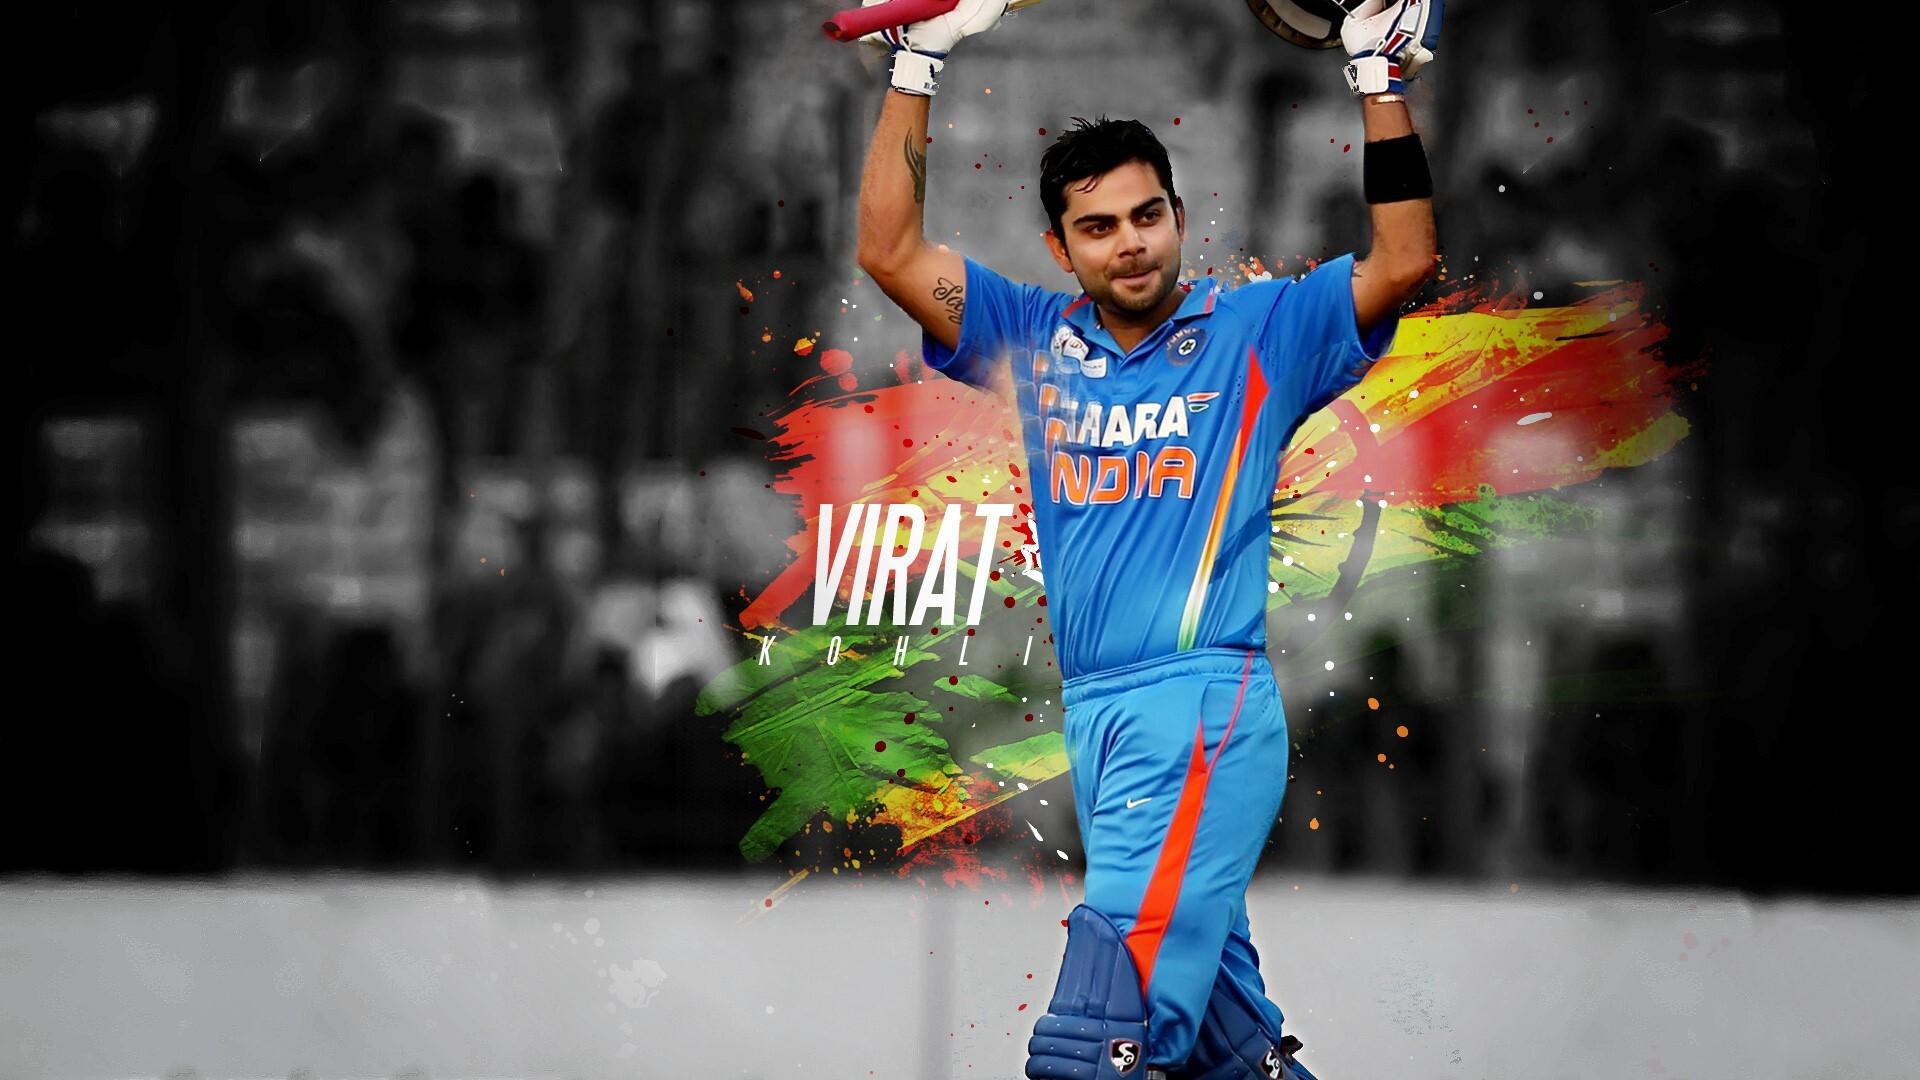 Handsome Virat Kohli With Bat Indian Cricket Player Wallpapers Hd